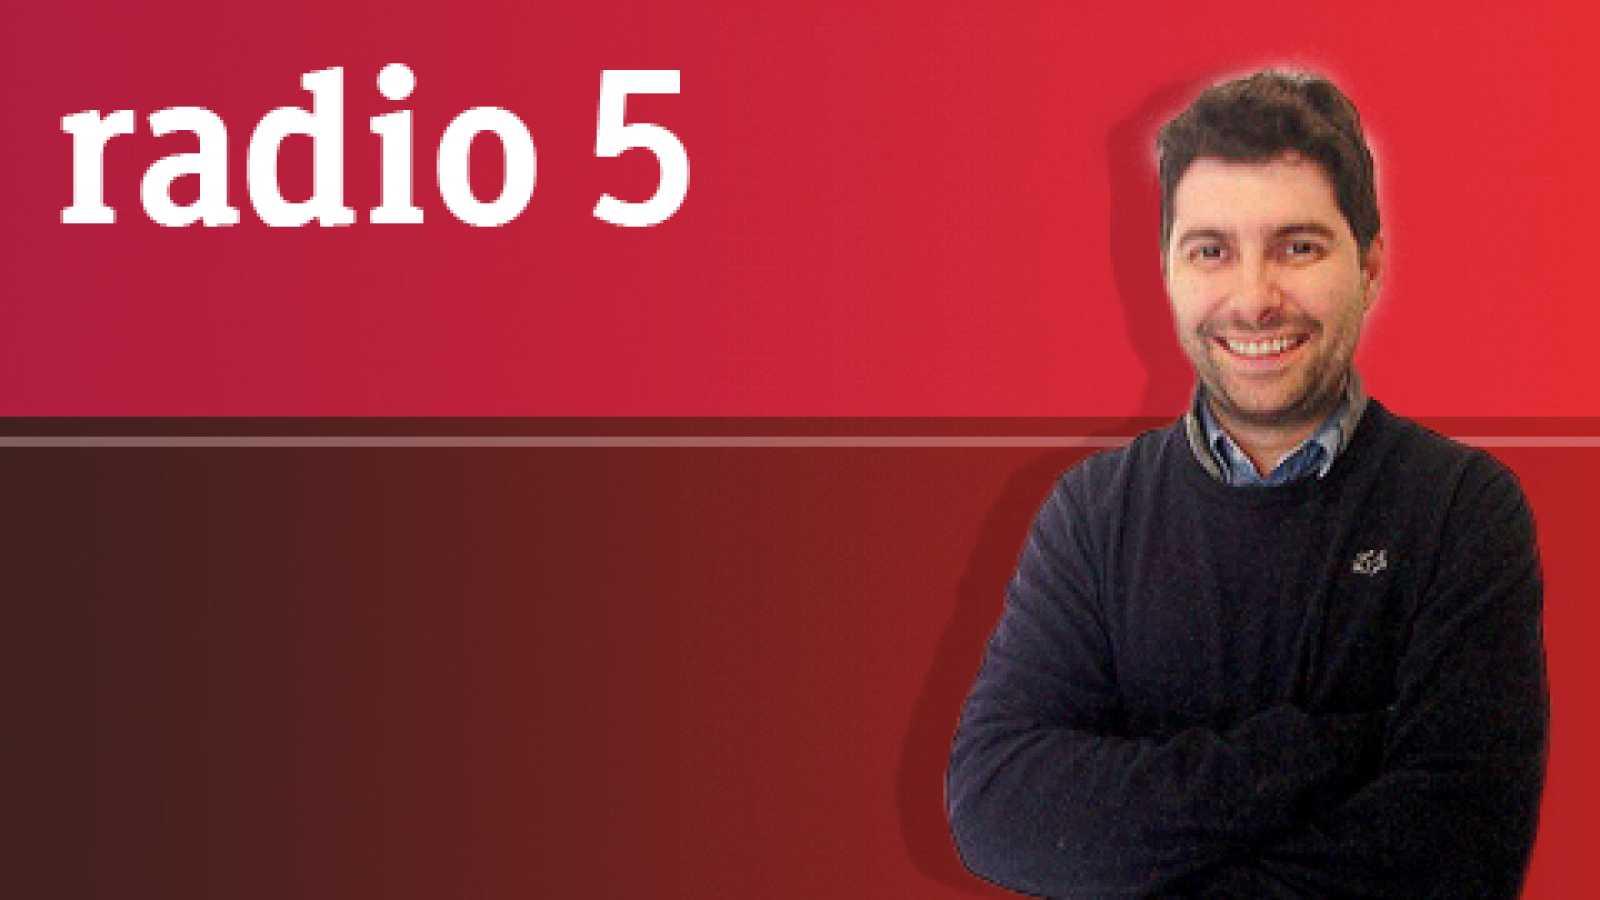 Condumio canario - La Pachanga - 31/01/15 - escuchar ahora